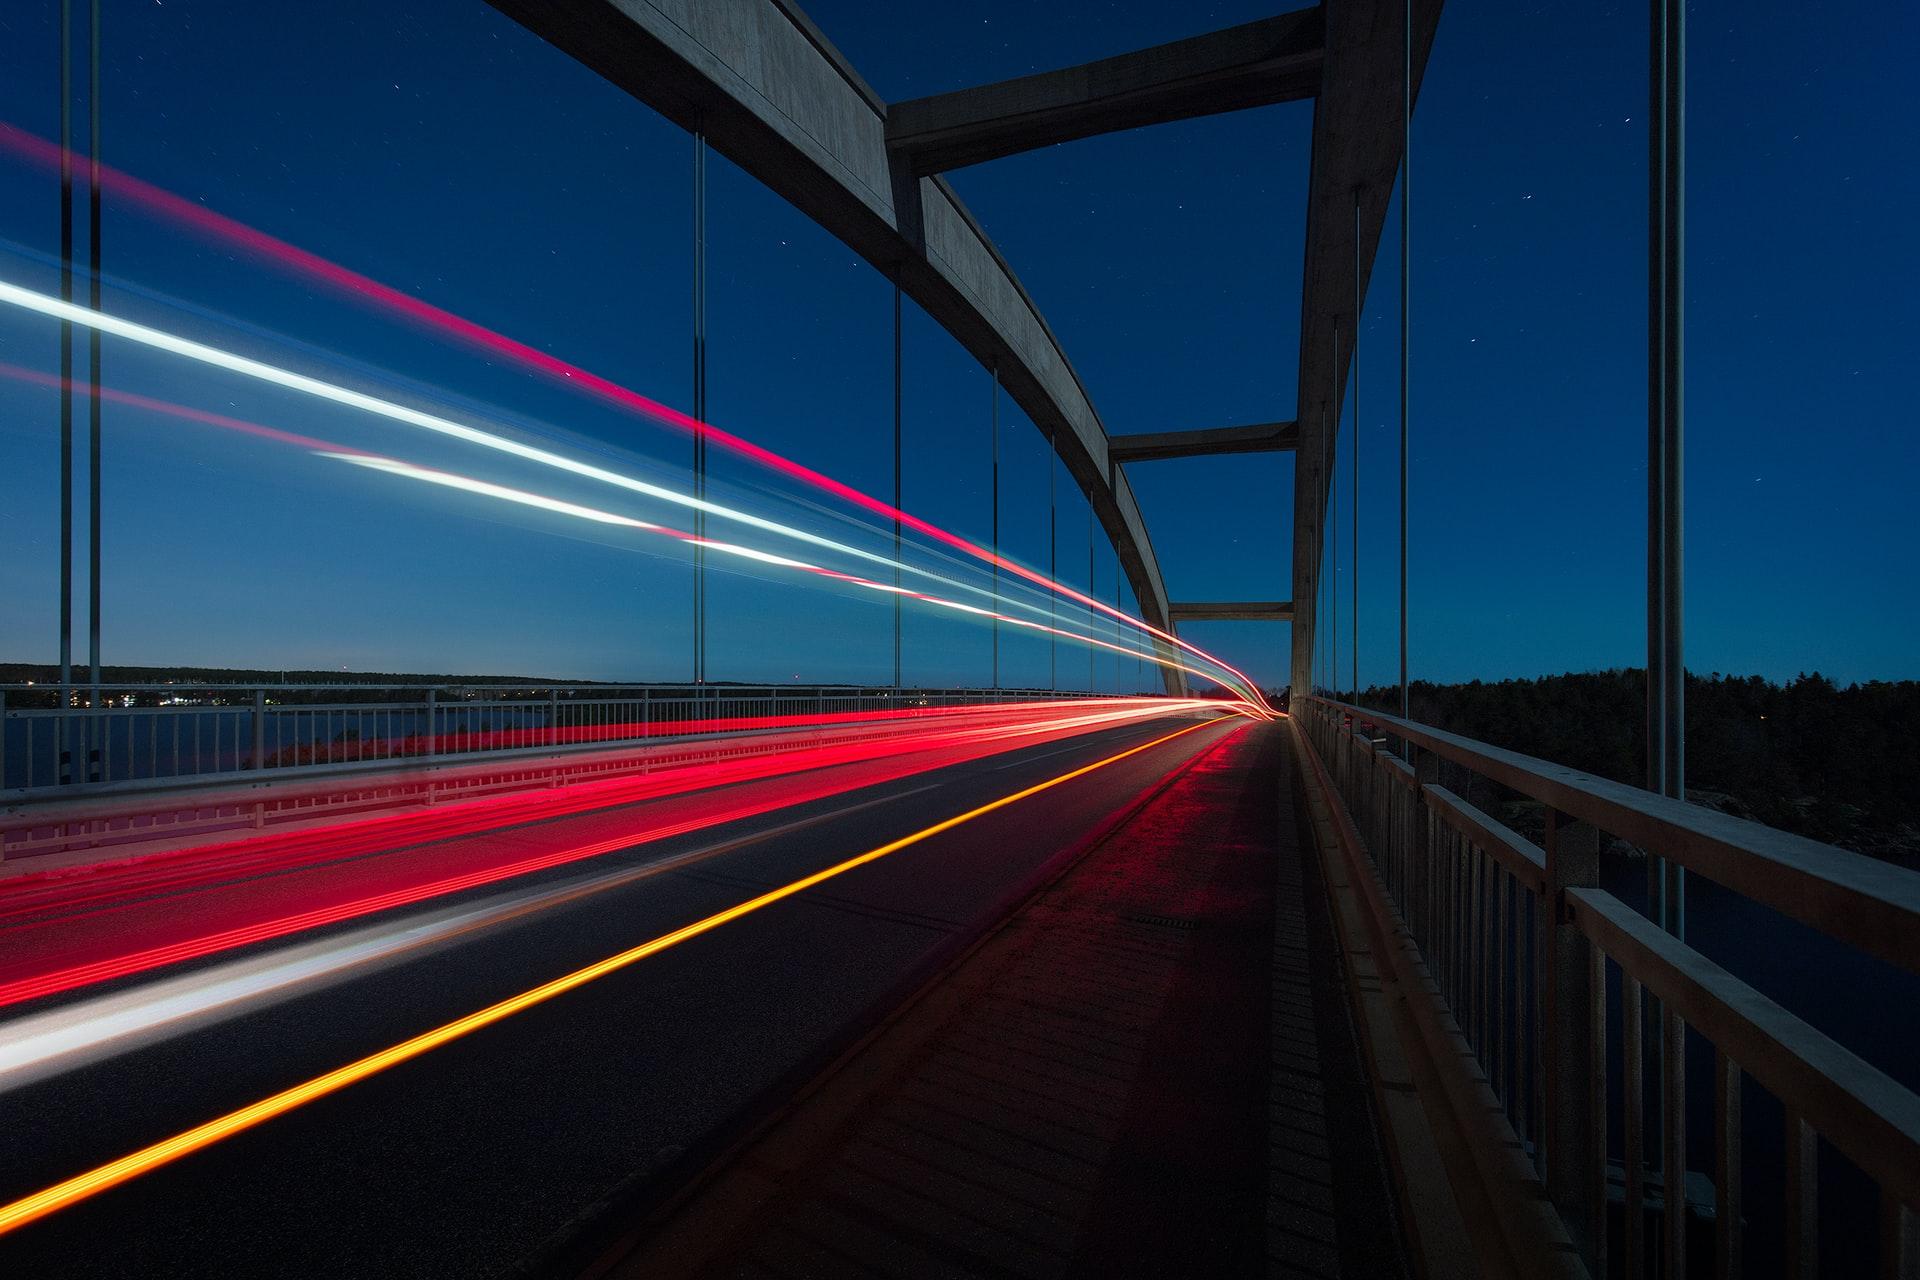 Lights over a bridge